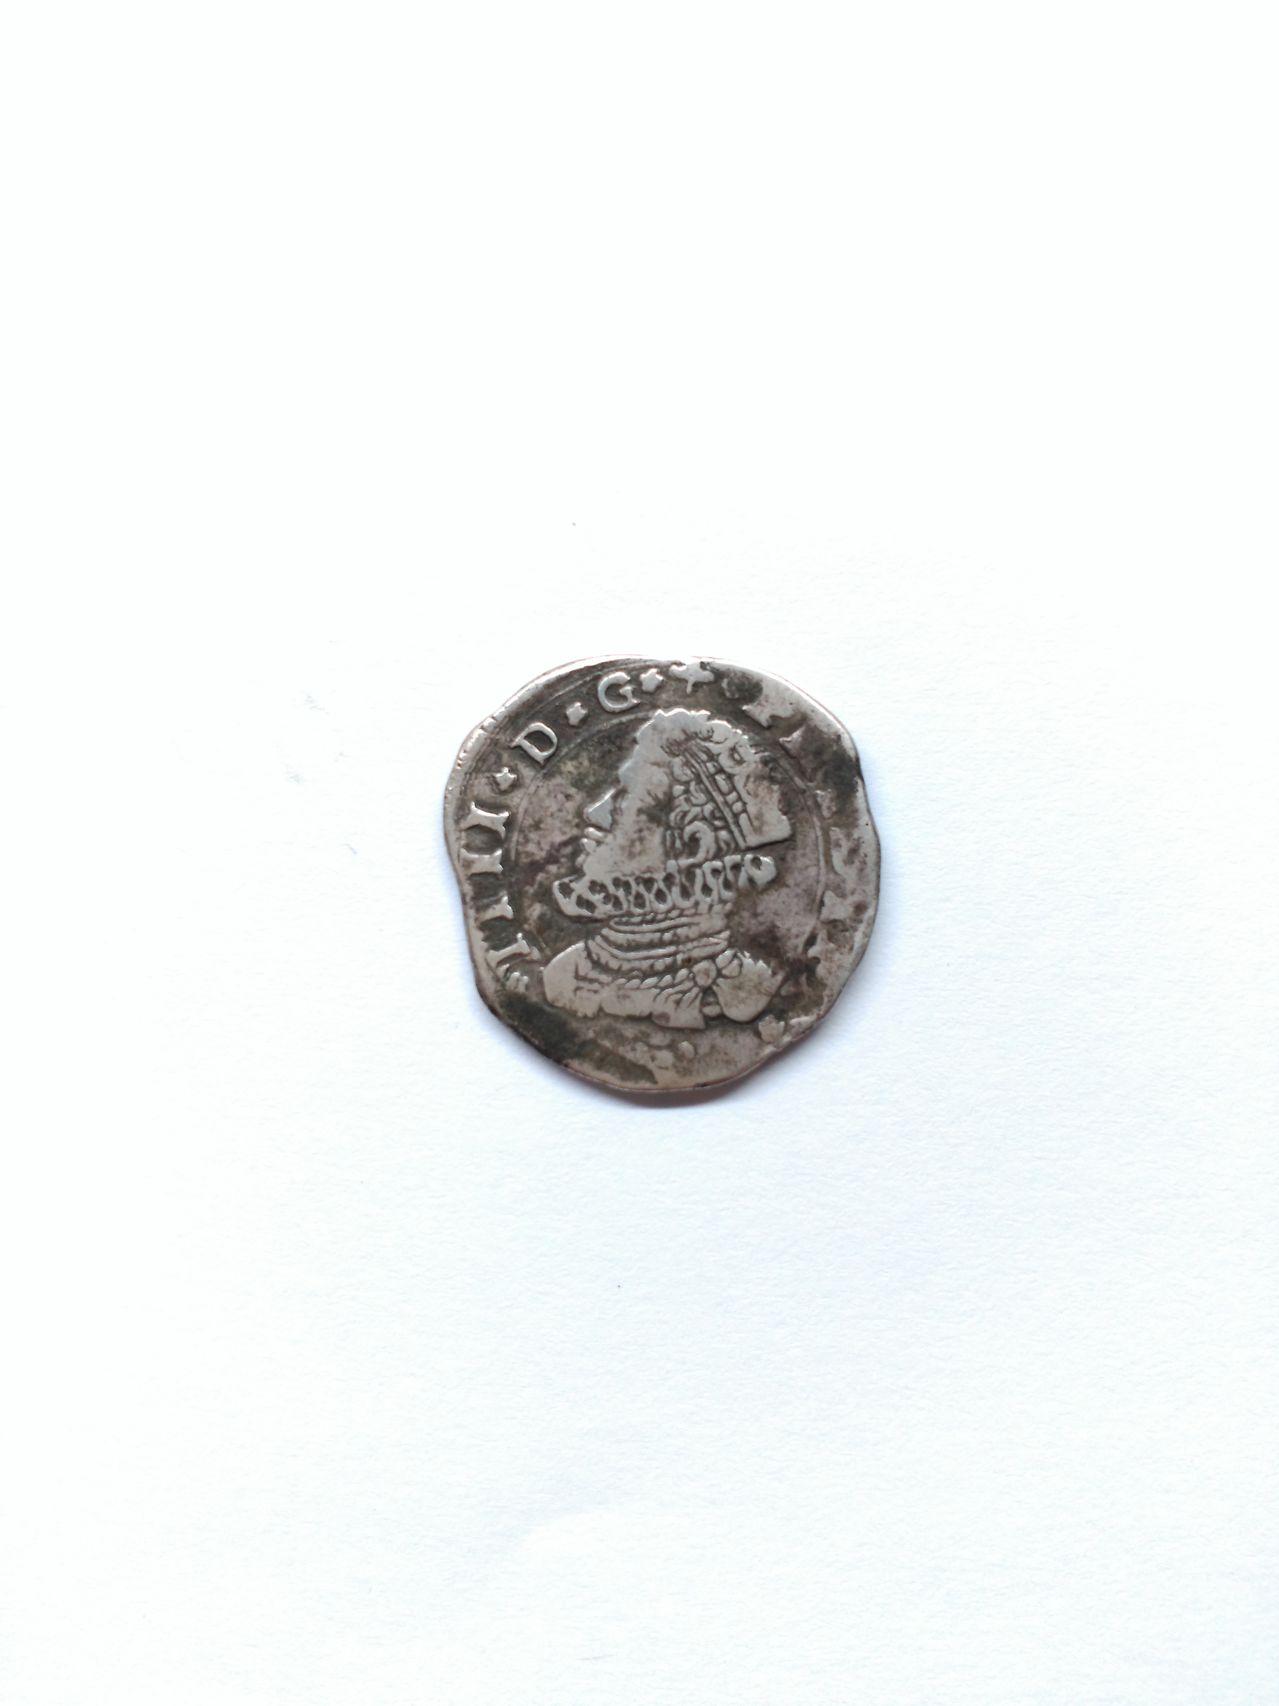 3 taris de Felipe IV año 1627 de Sicilia IMG_20160202_182947